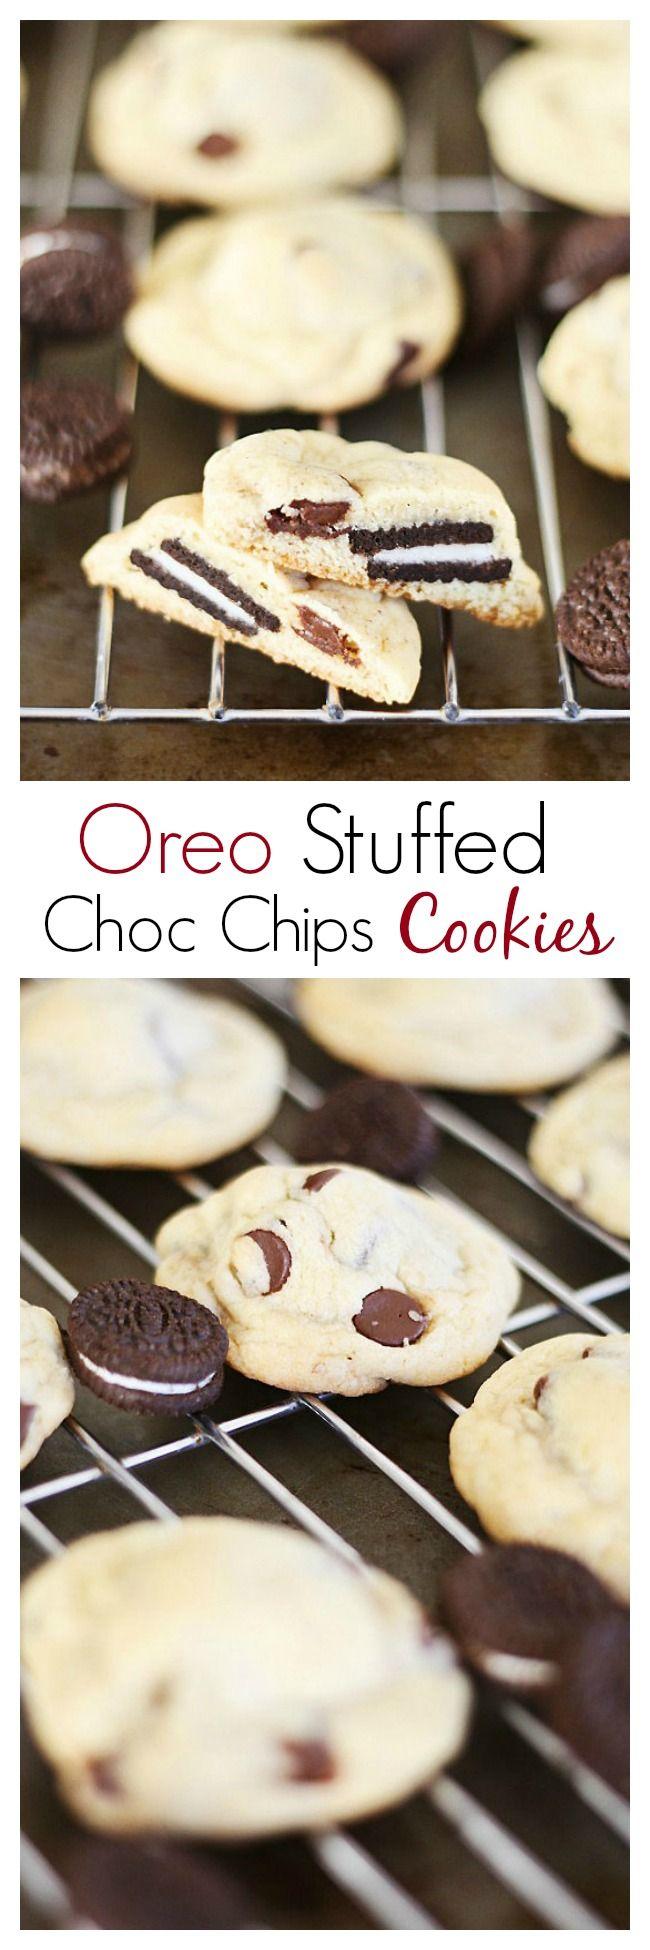 Easy Oreo-stuffed chocolate chip cookies recipe. Sweet crunchy cookies with creamy Oreo inside, a great treat. Recipe by @jennyflake  rasamalaysia.com